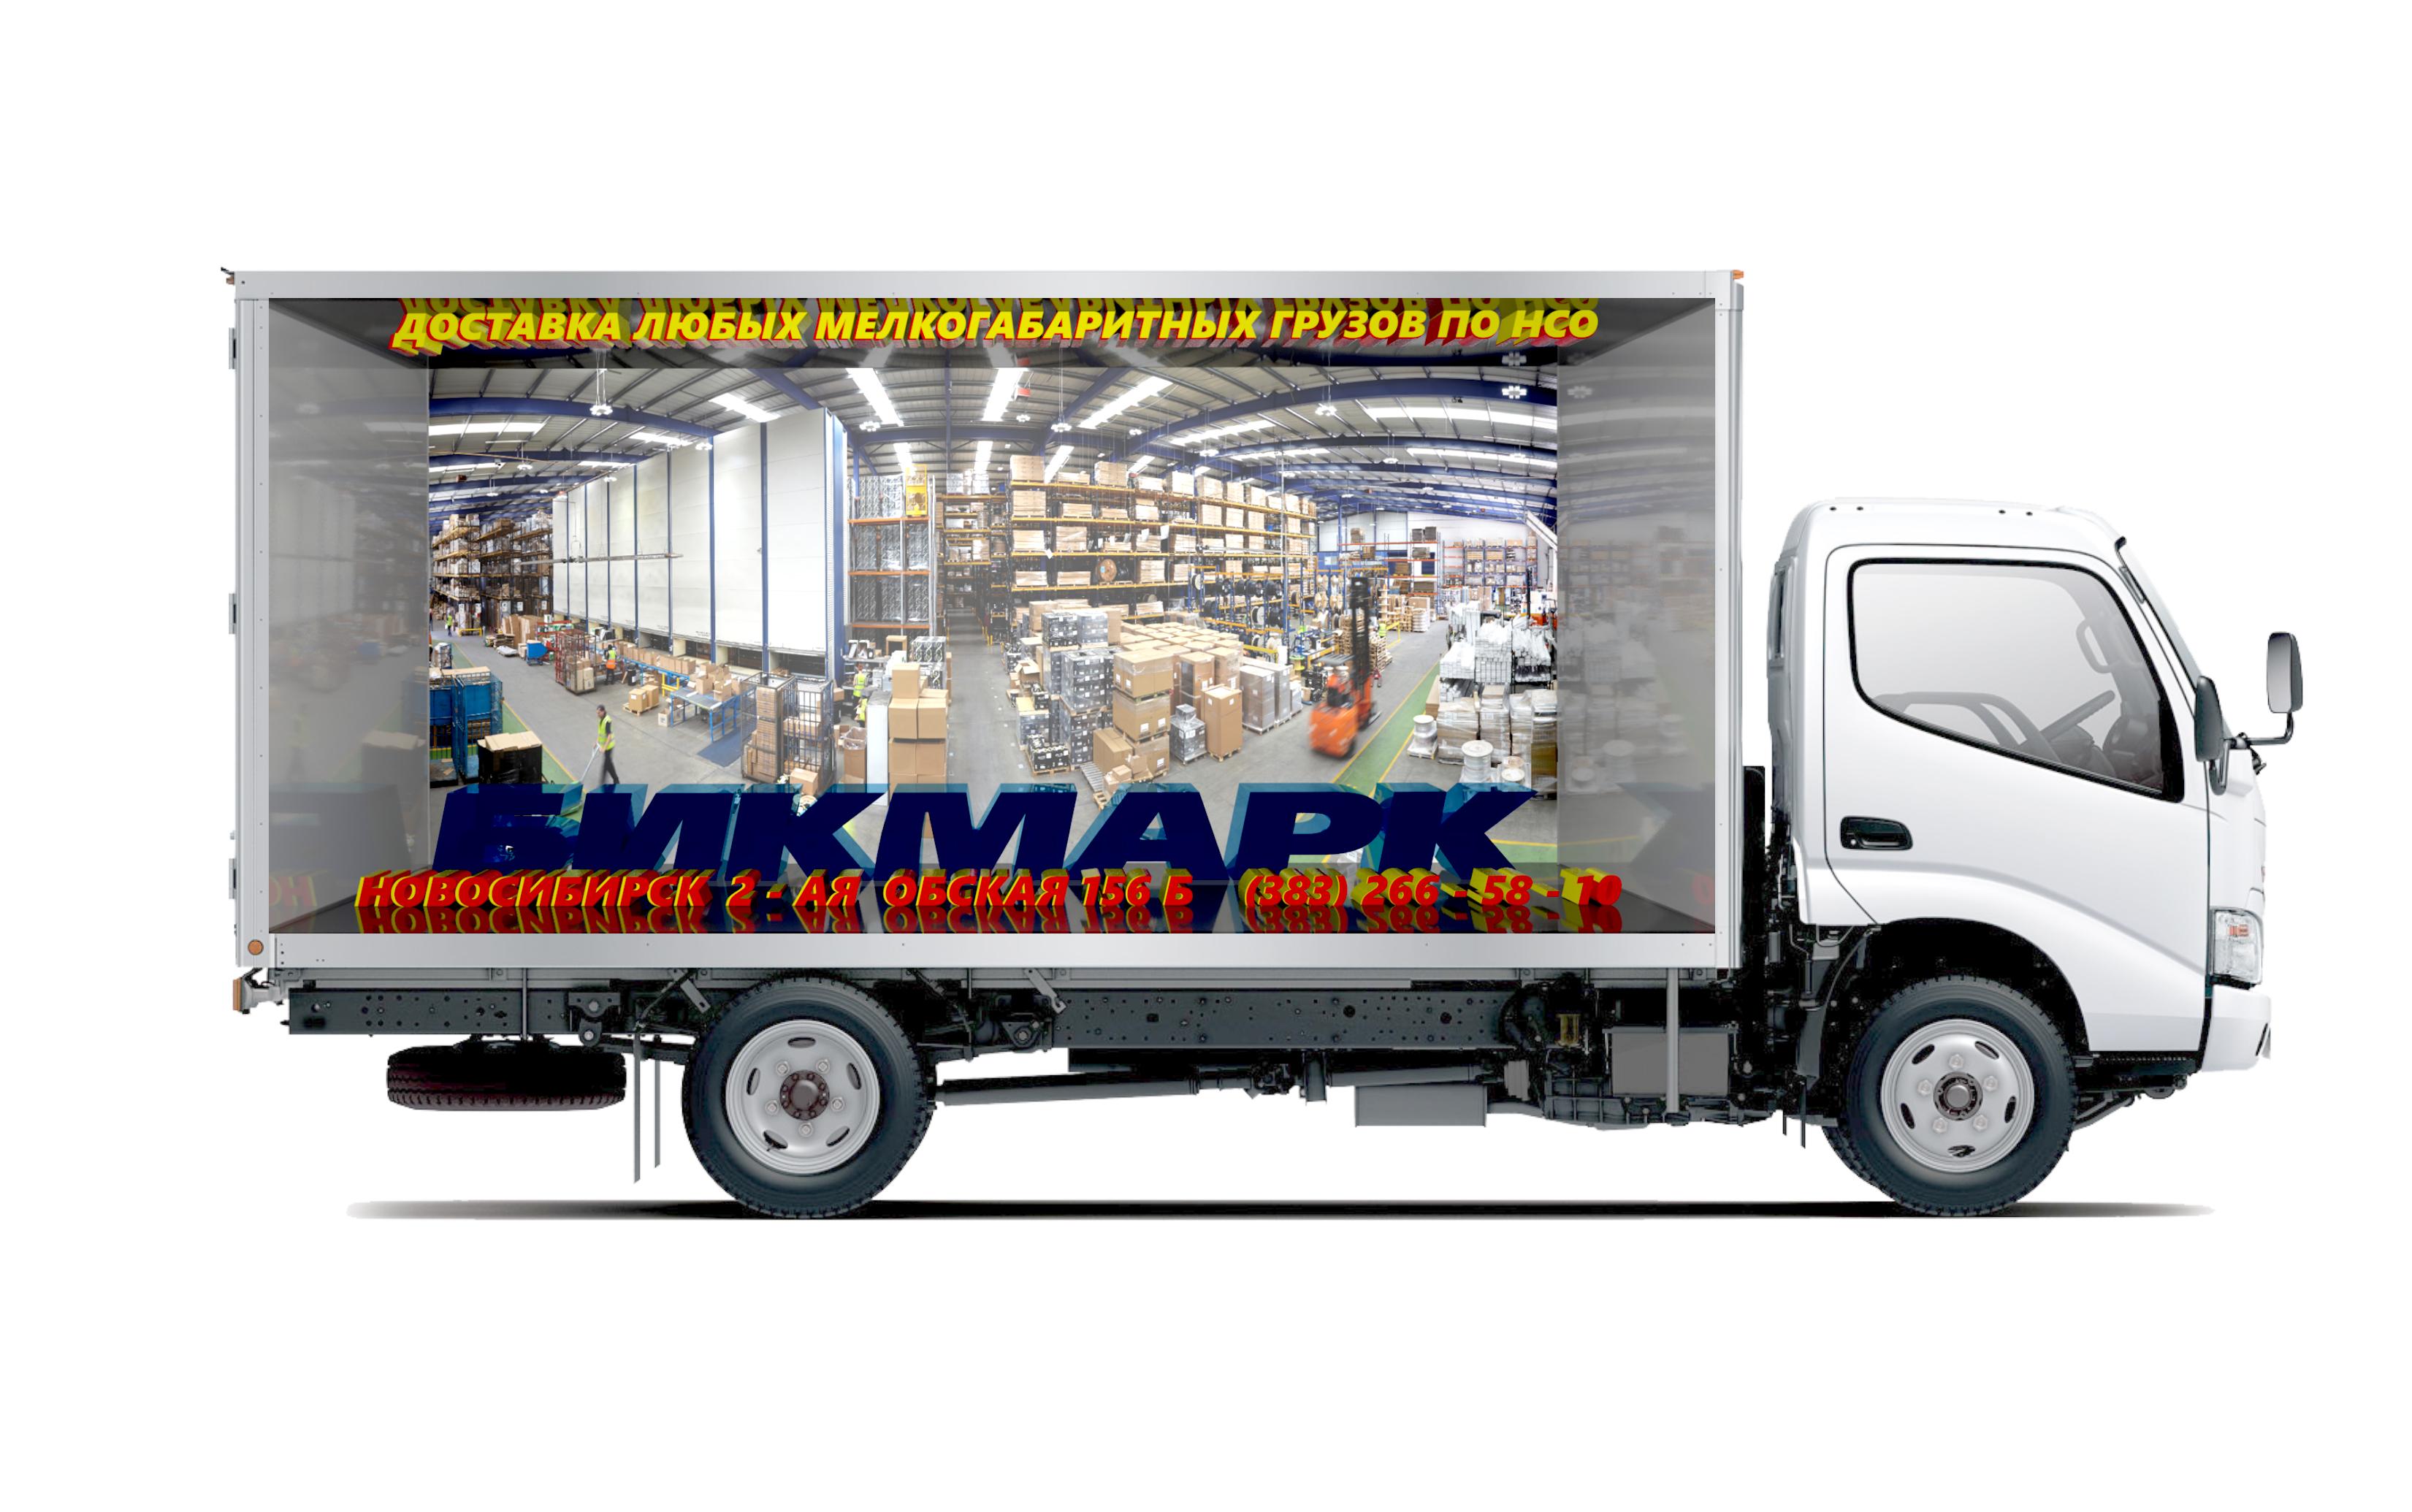 Разработка  рекламы на грузовые машины фото f_4415b2e9909b6a15.jpg